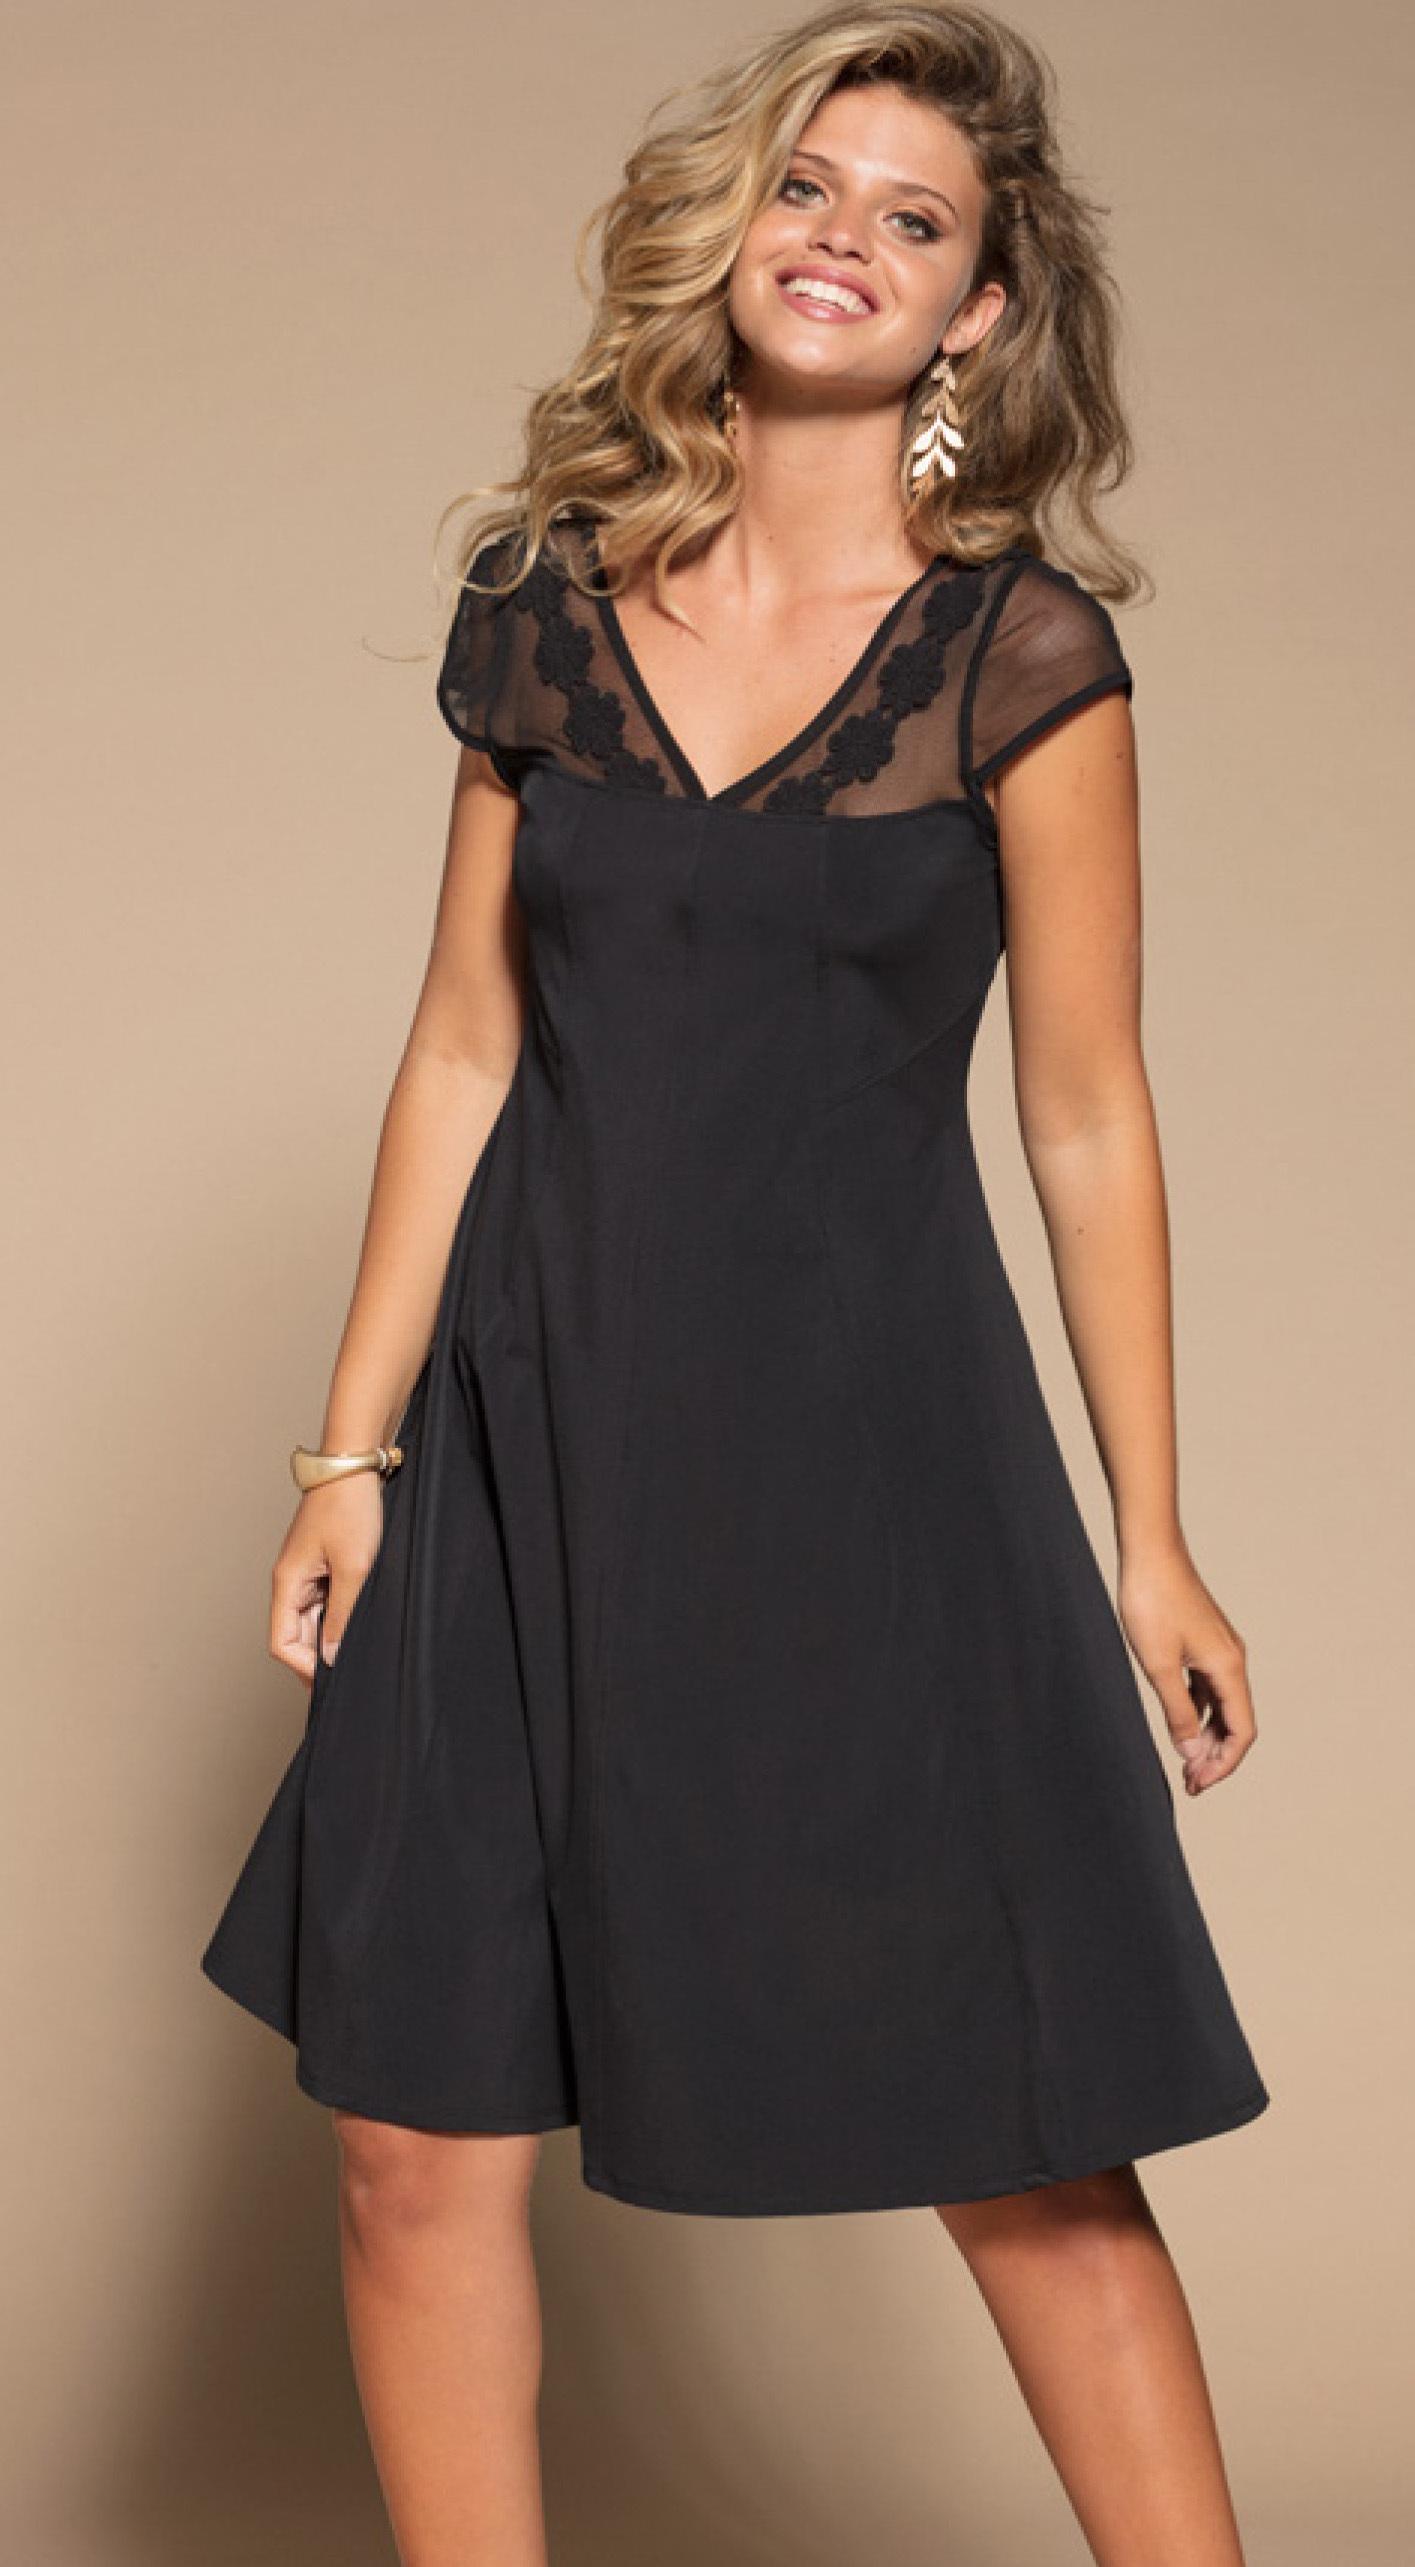 Maloka: Never Take Me Off Little Black Dress (Many Colors!) MK_KORBY